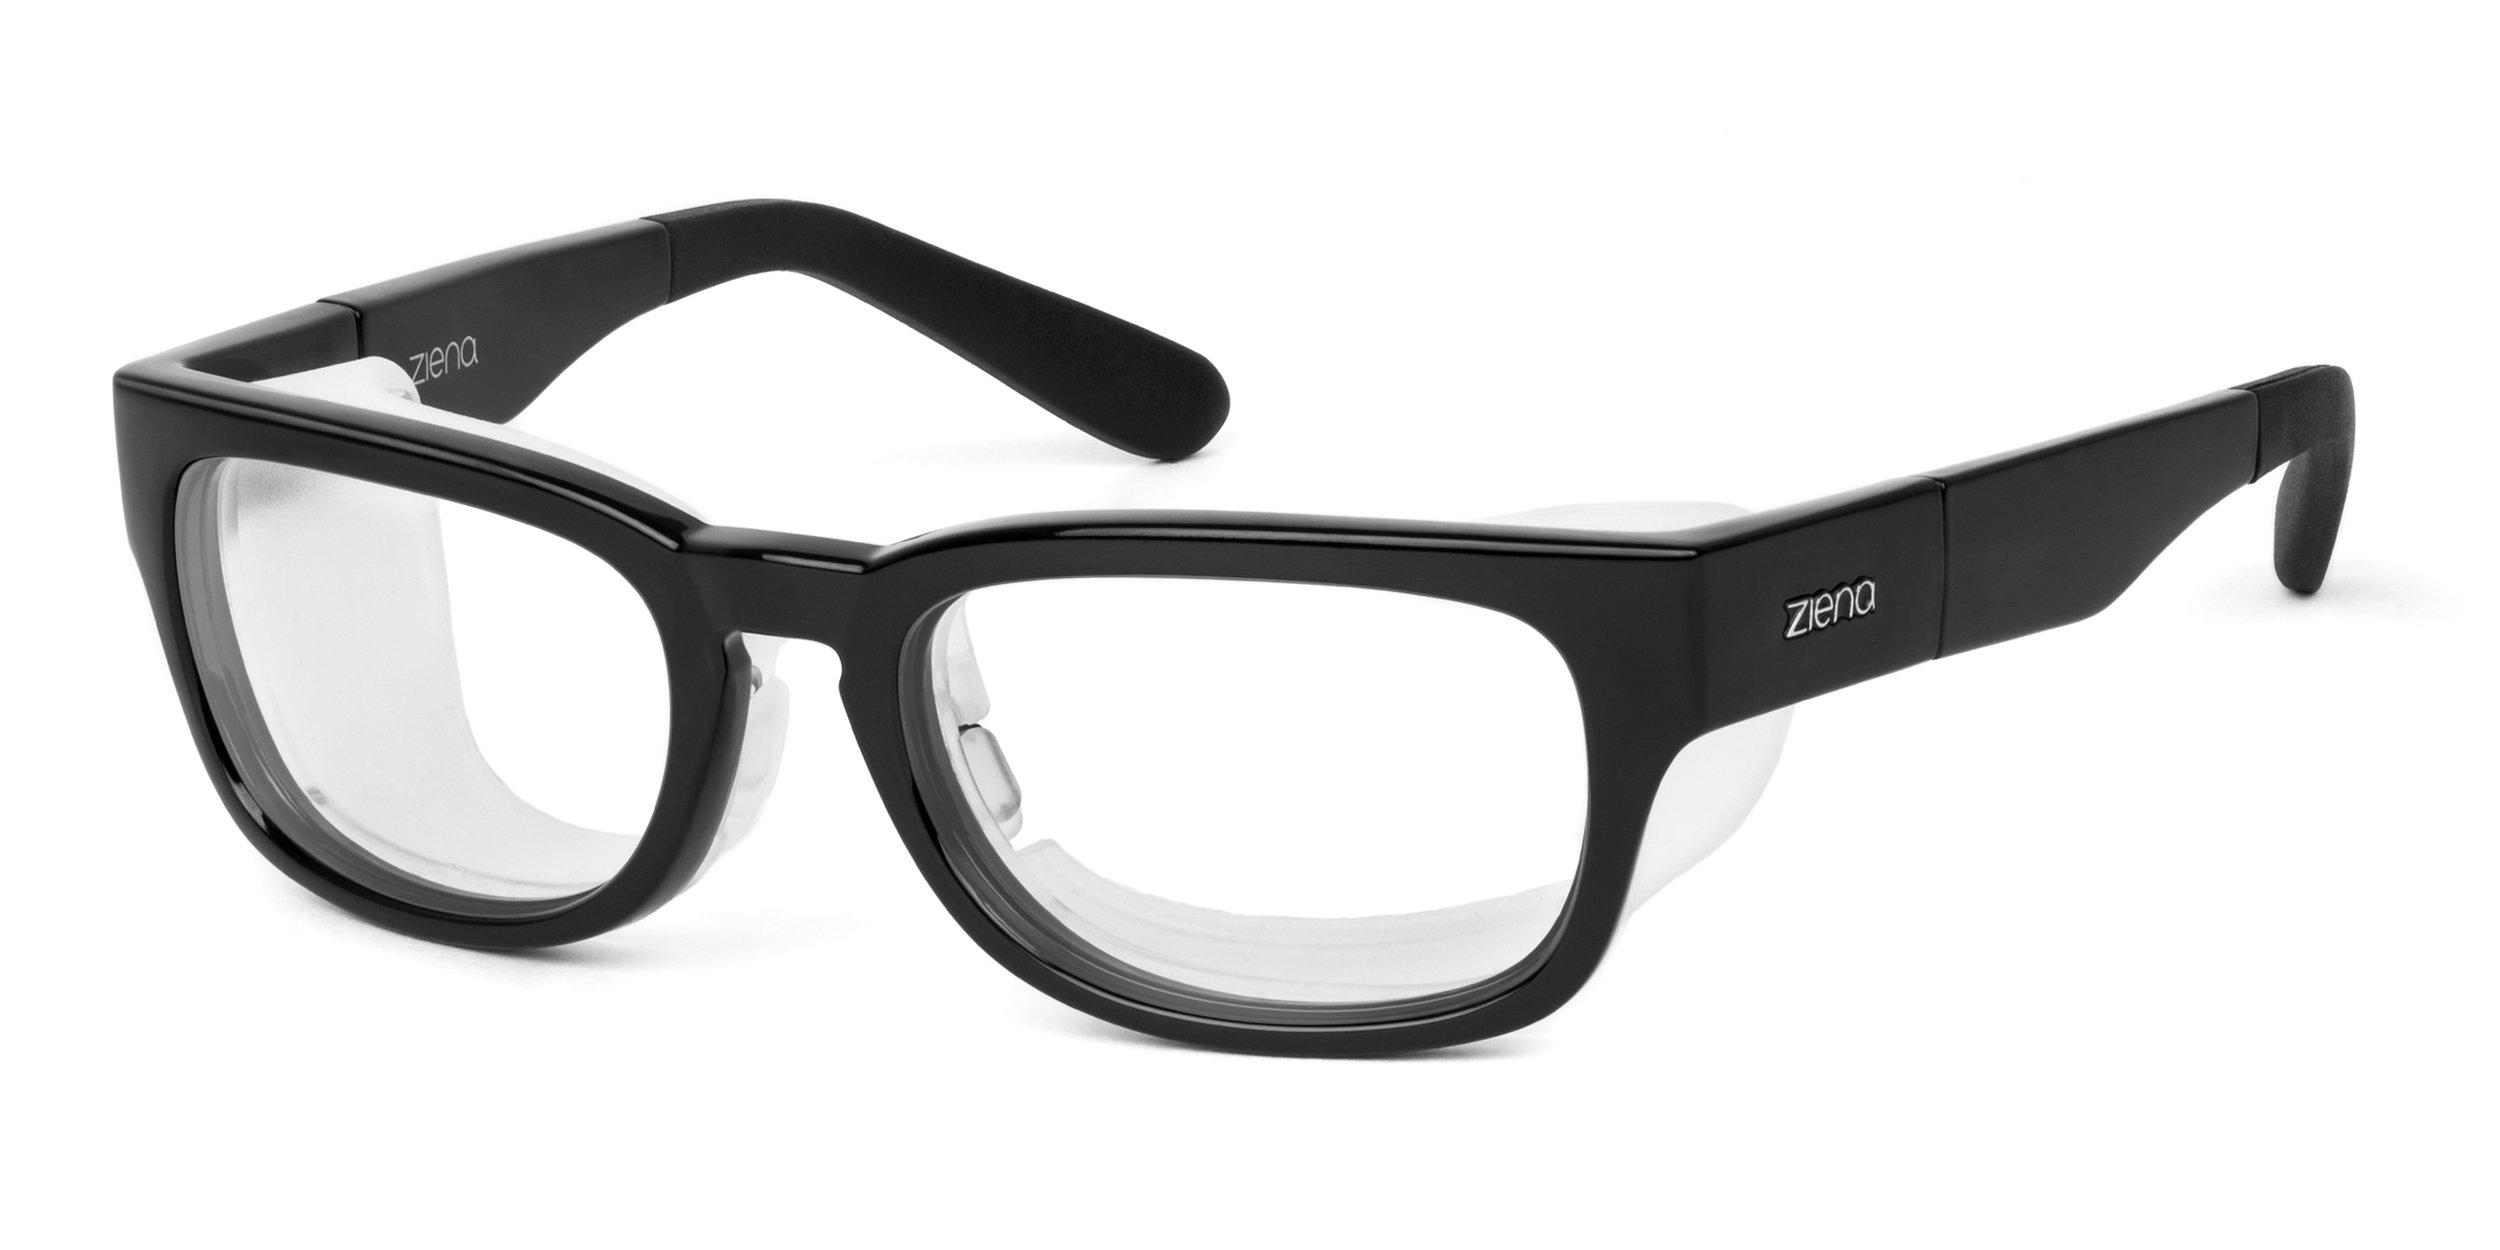 Ziena<sup>®</sup> Moisture Chamber Glasses